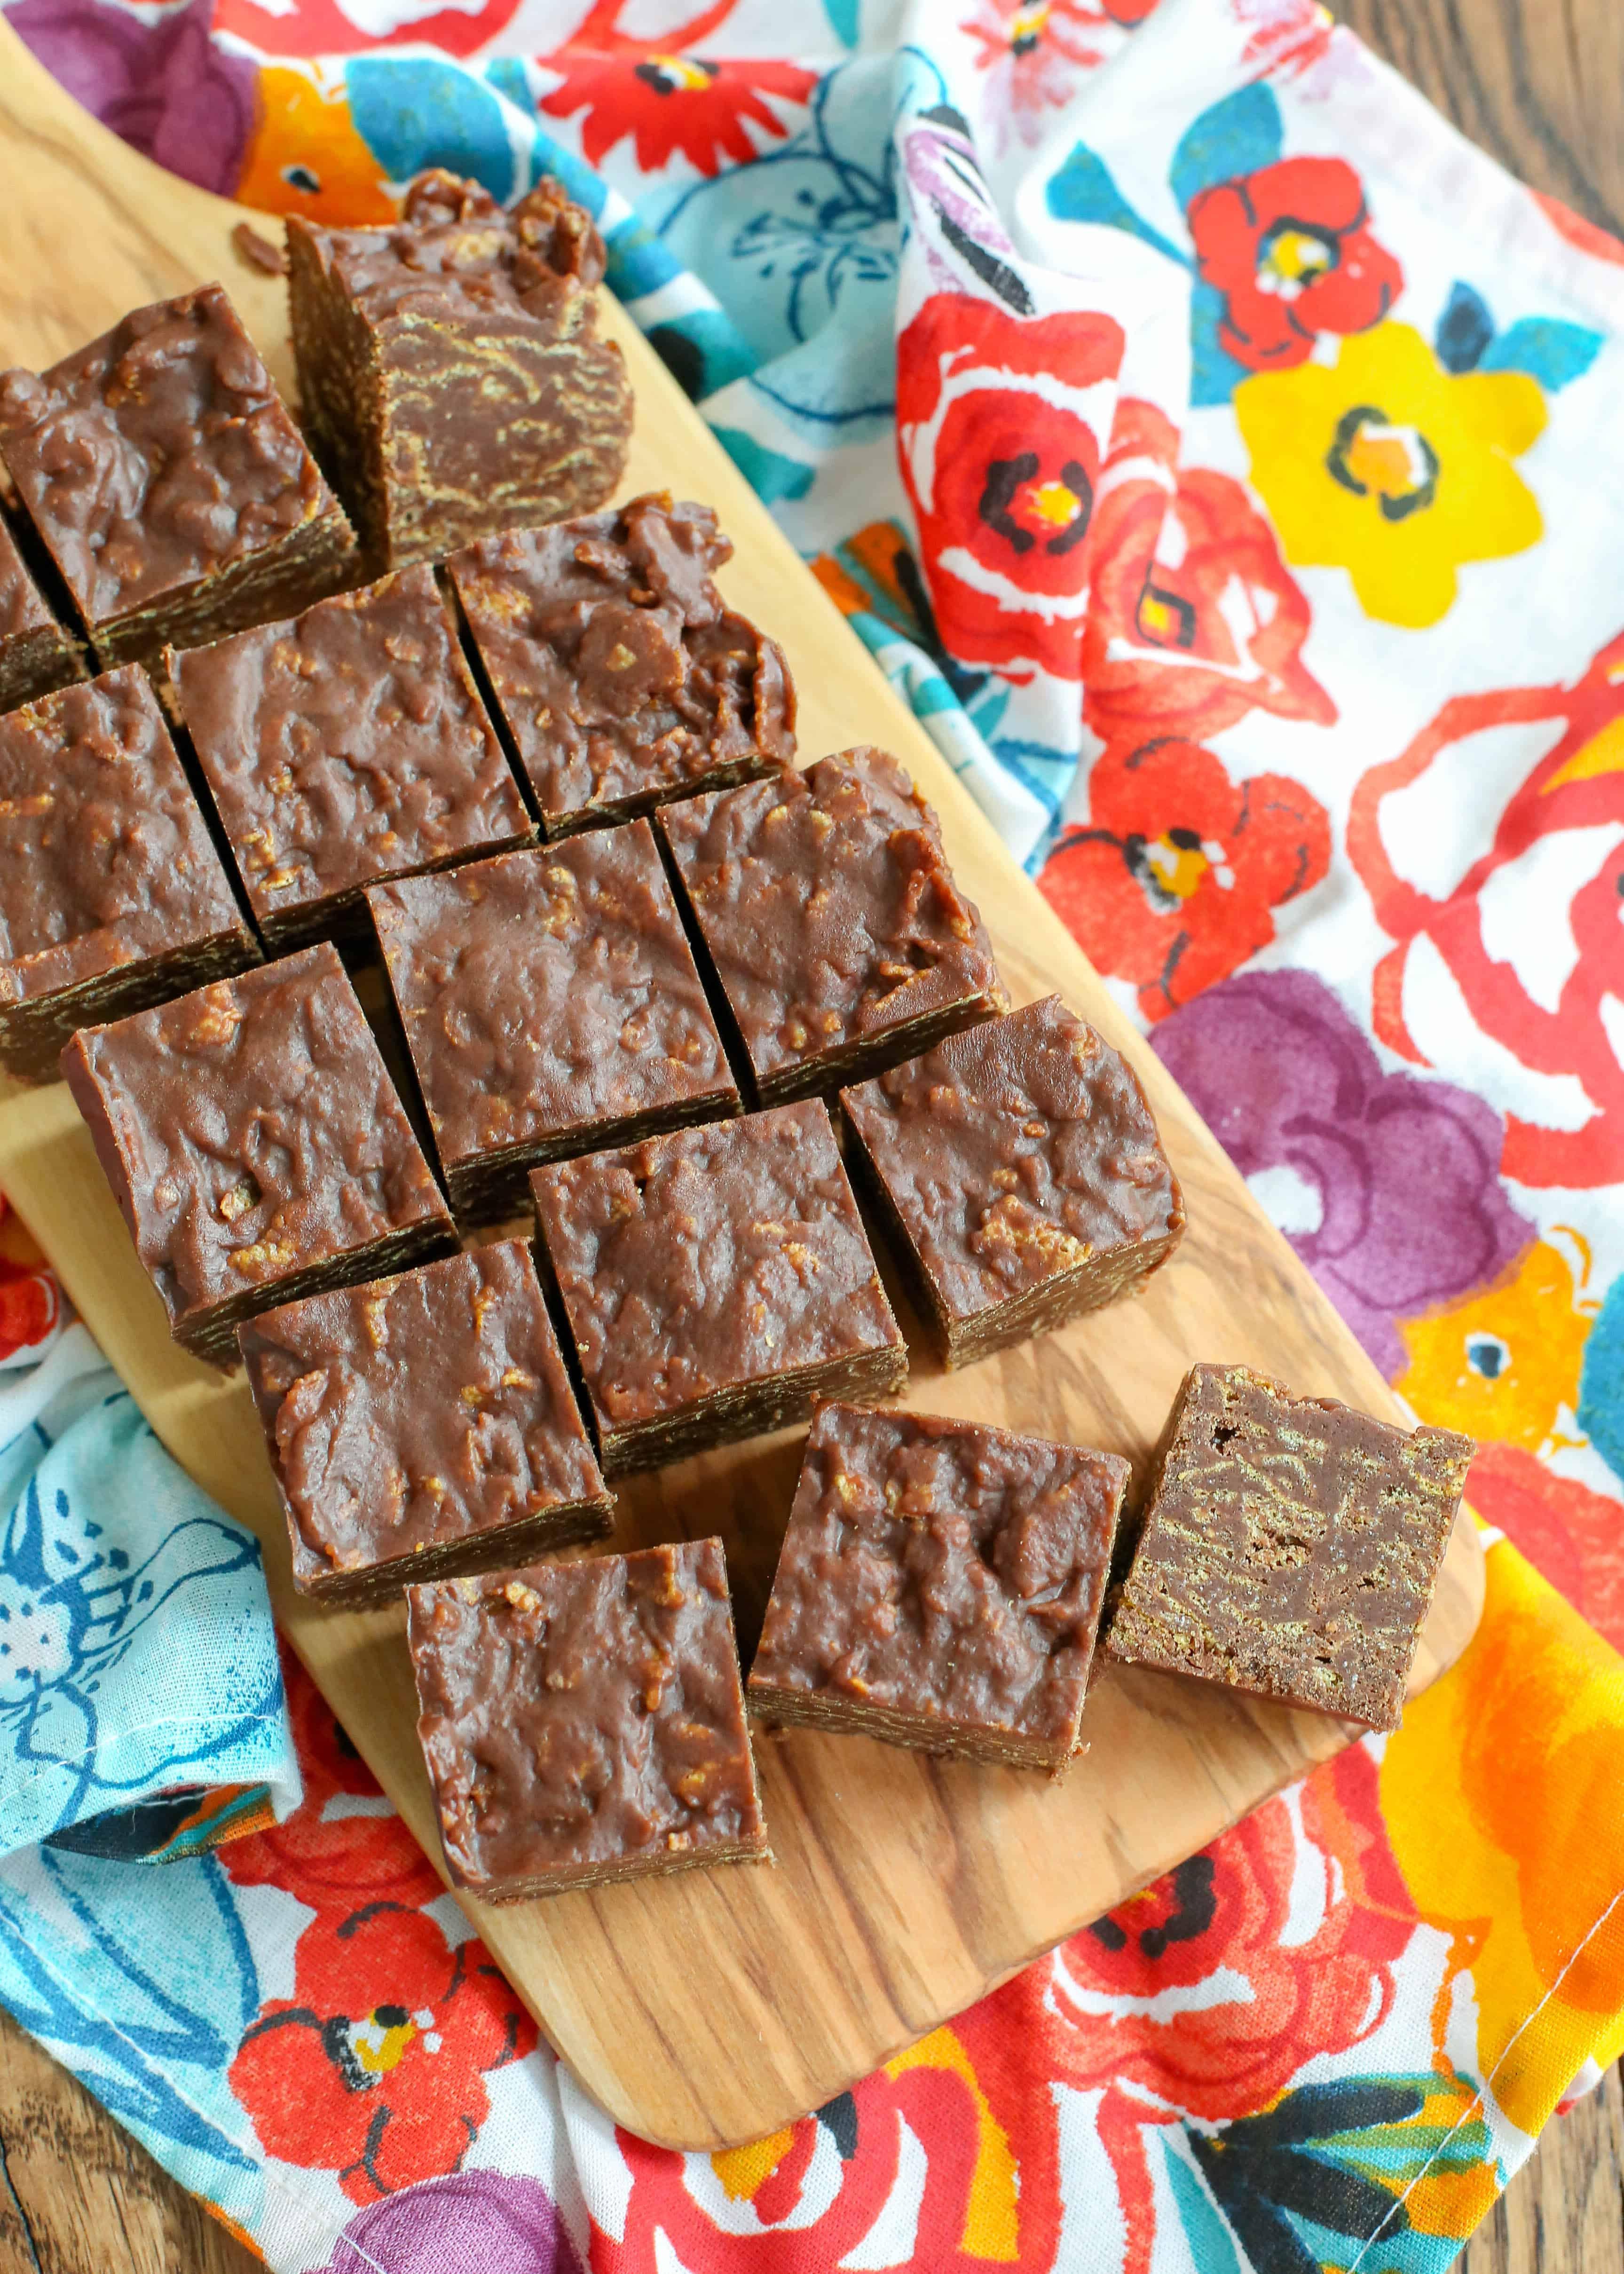 No Bake Chocolate Crunch Bars